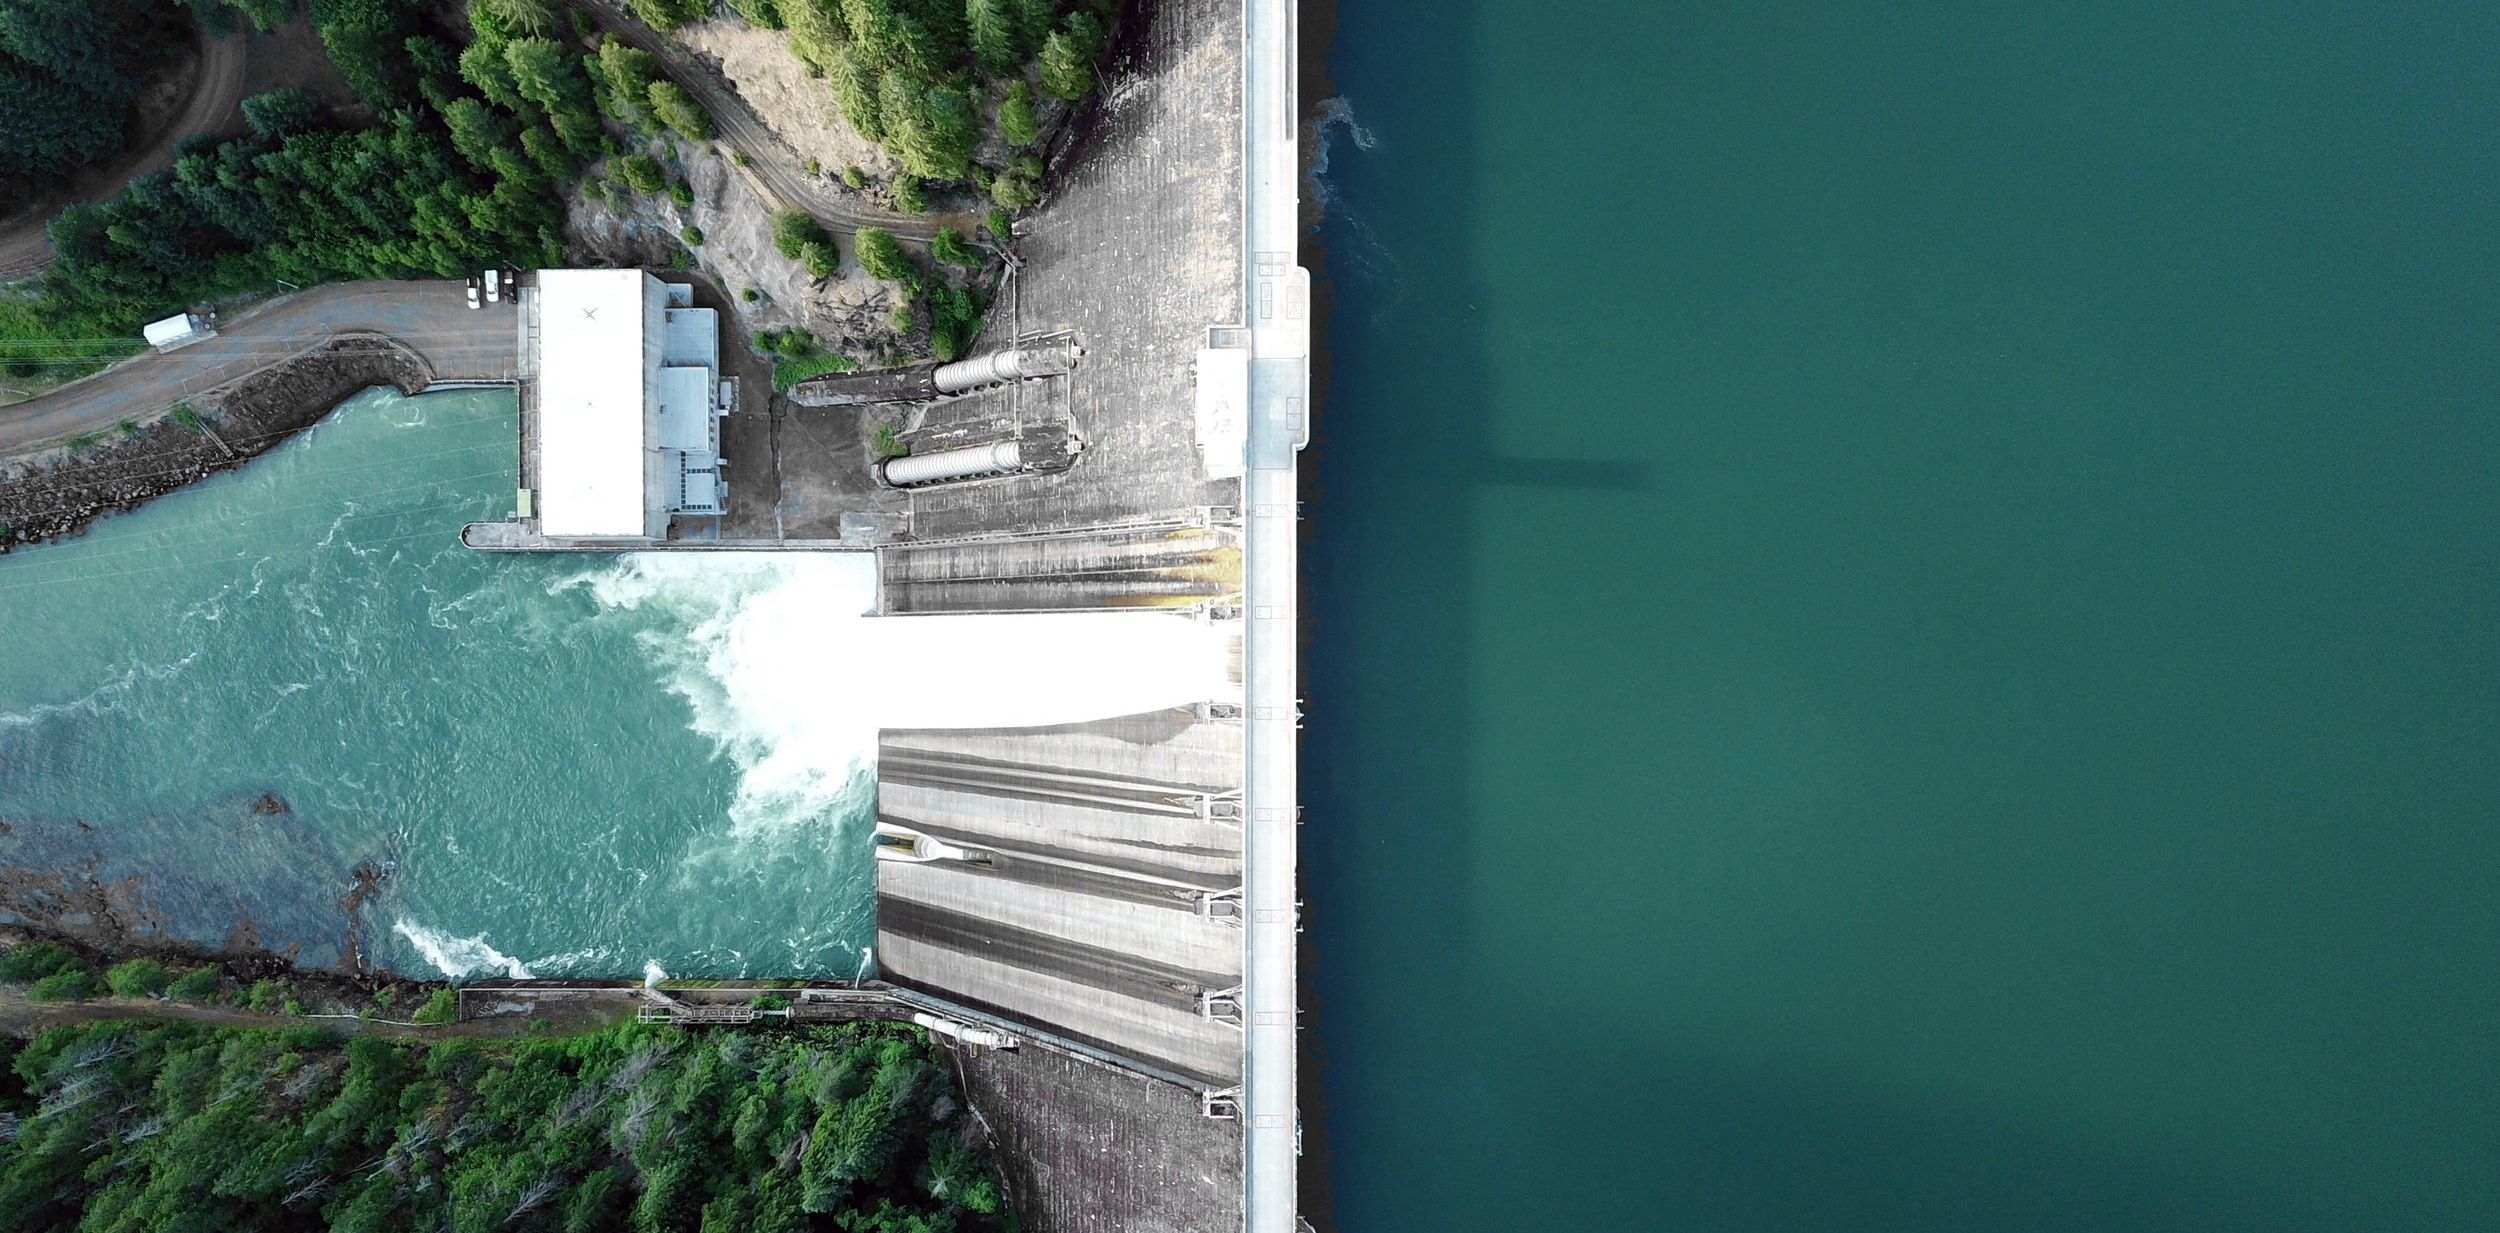 Detroit Dam, Detroit, Oregon, United States. Photo by    Dan Meyers    on    Unsplash   .